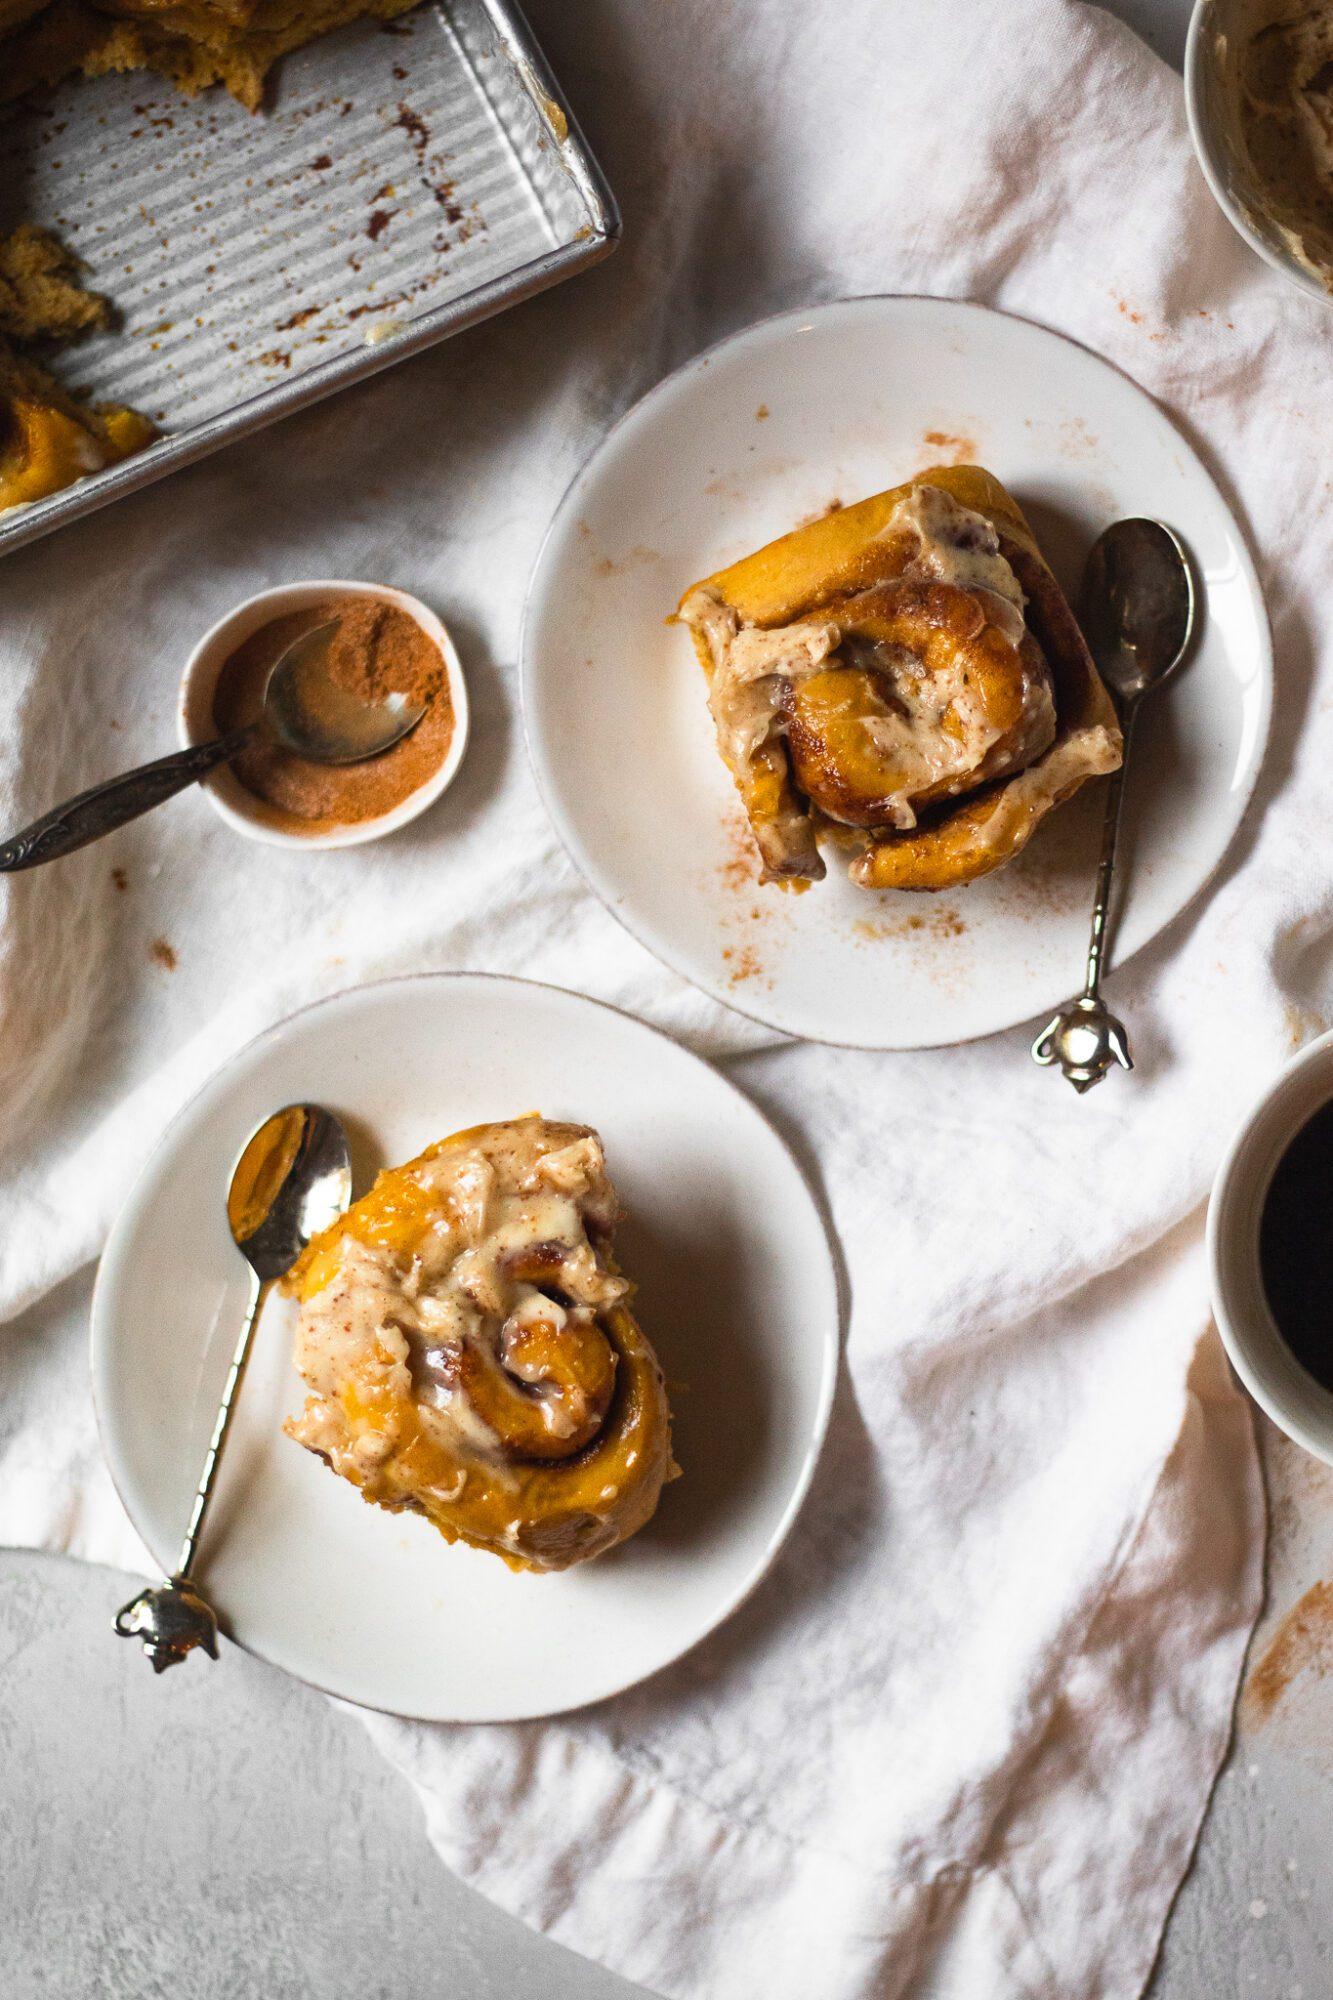 pumpkin cinnamon rolls on plates